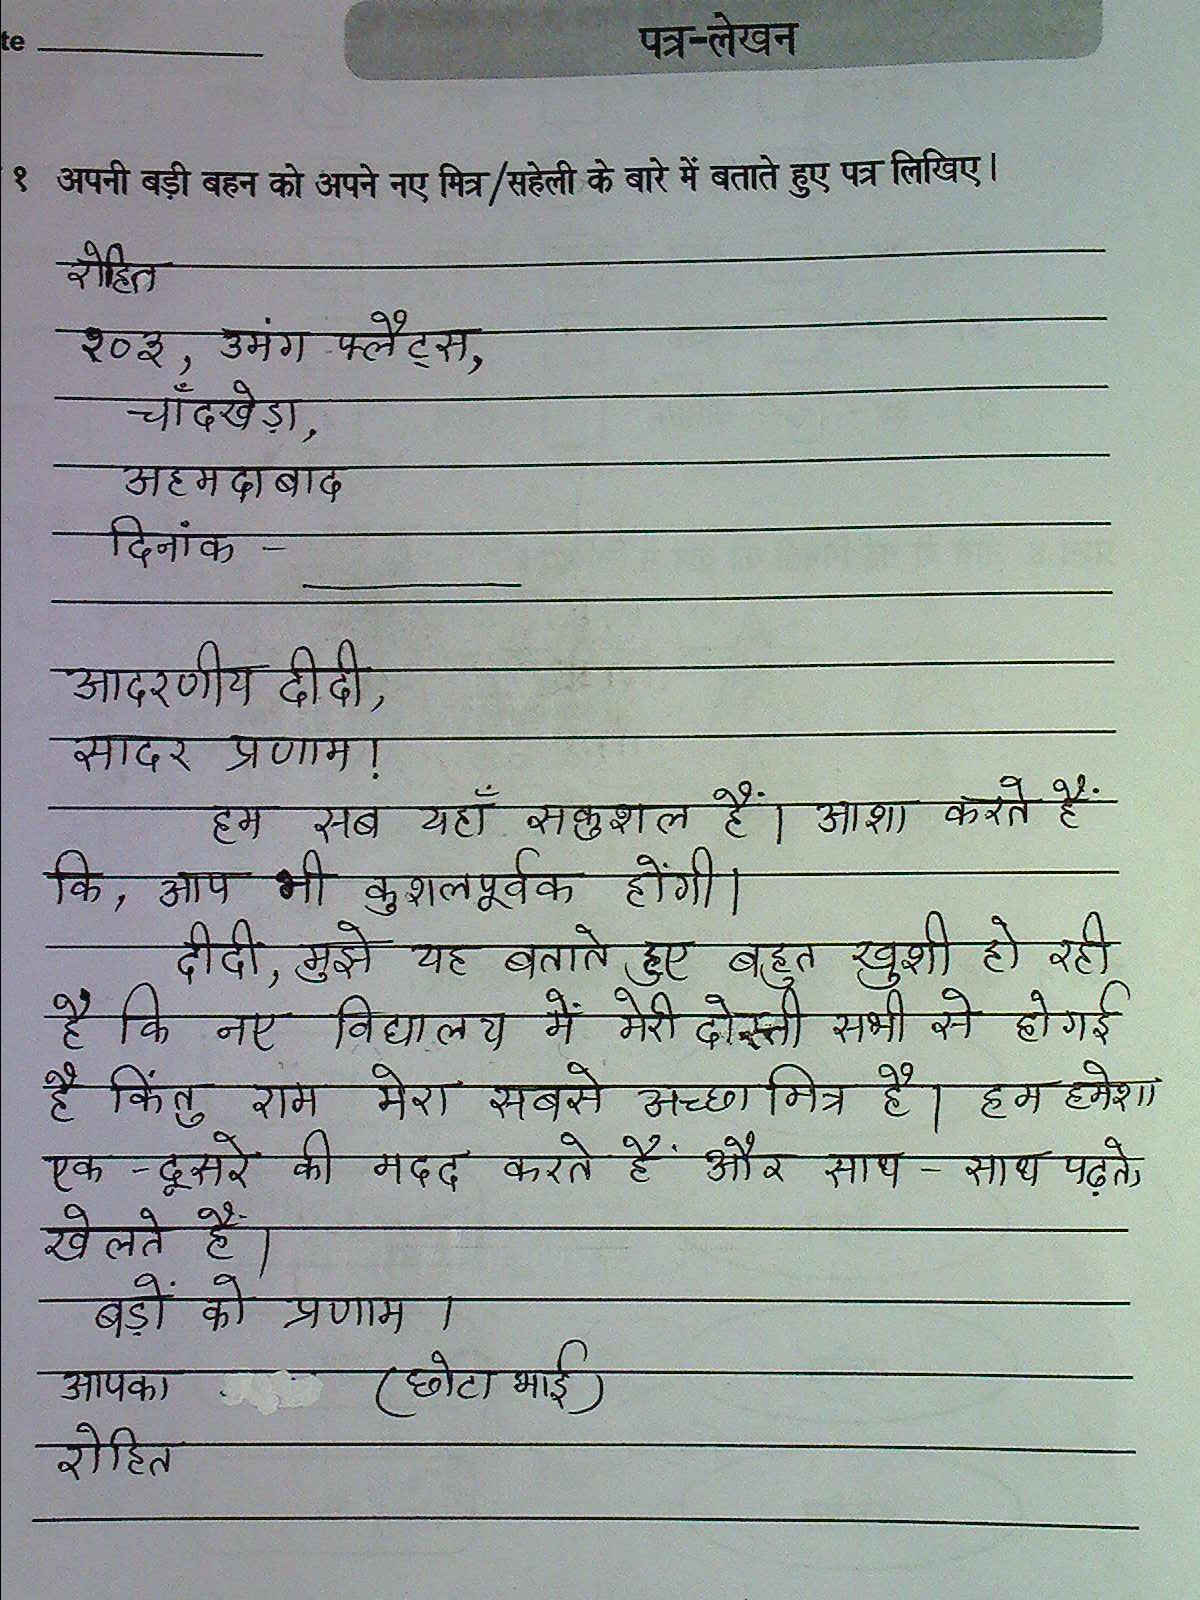 Stars of pis ahmedabad std iii hindi grammar patra lekhan for Koi 5 anopcharik patra